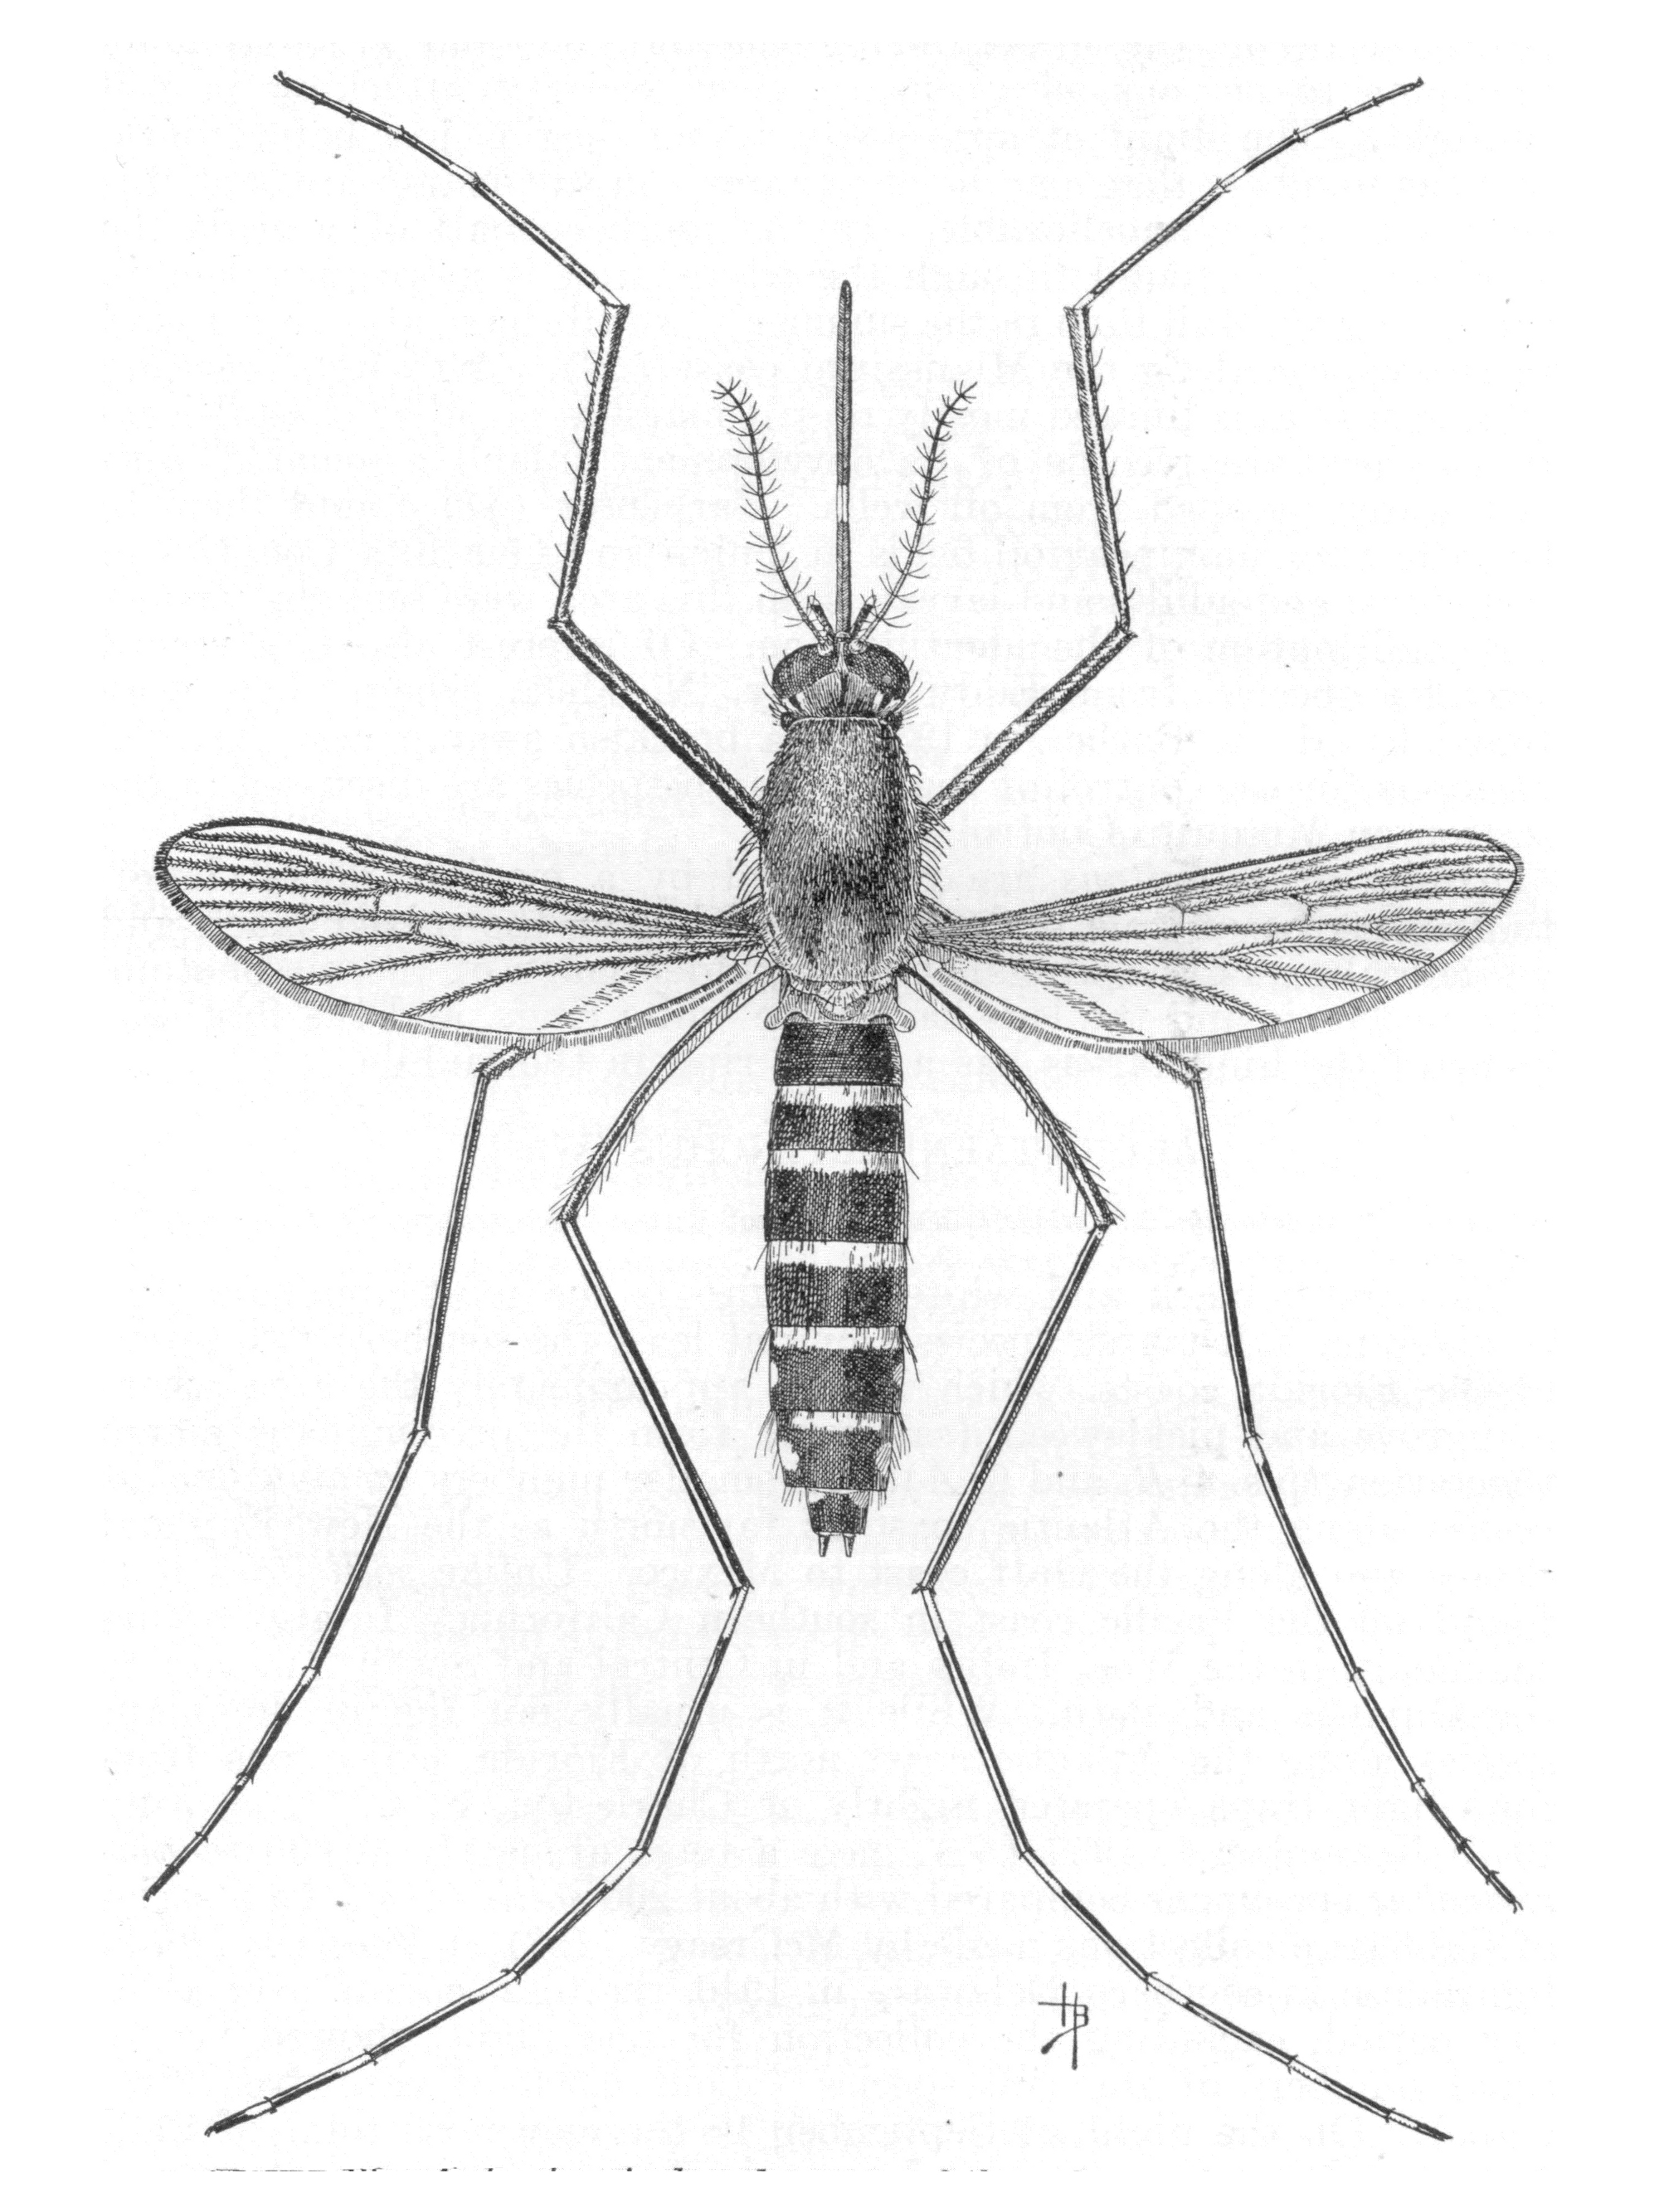 Ochlerotatus taeniorhynchus syn. Aedes taeniorhynchus aka the Black Salt Marsh Mosquito.jpg © n.n.